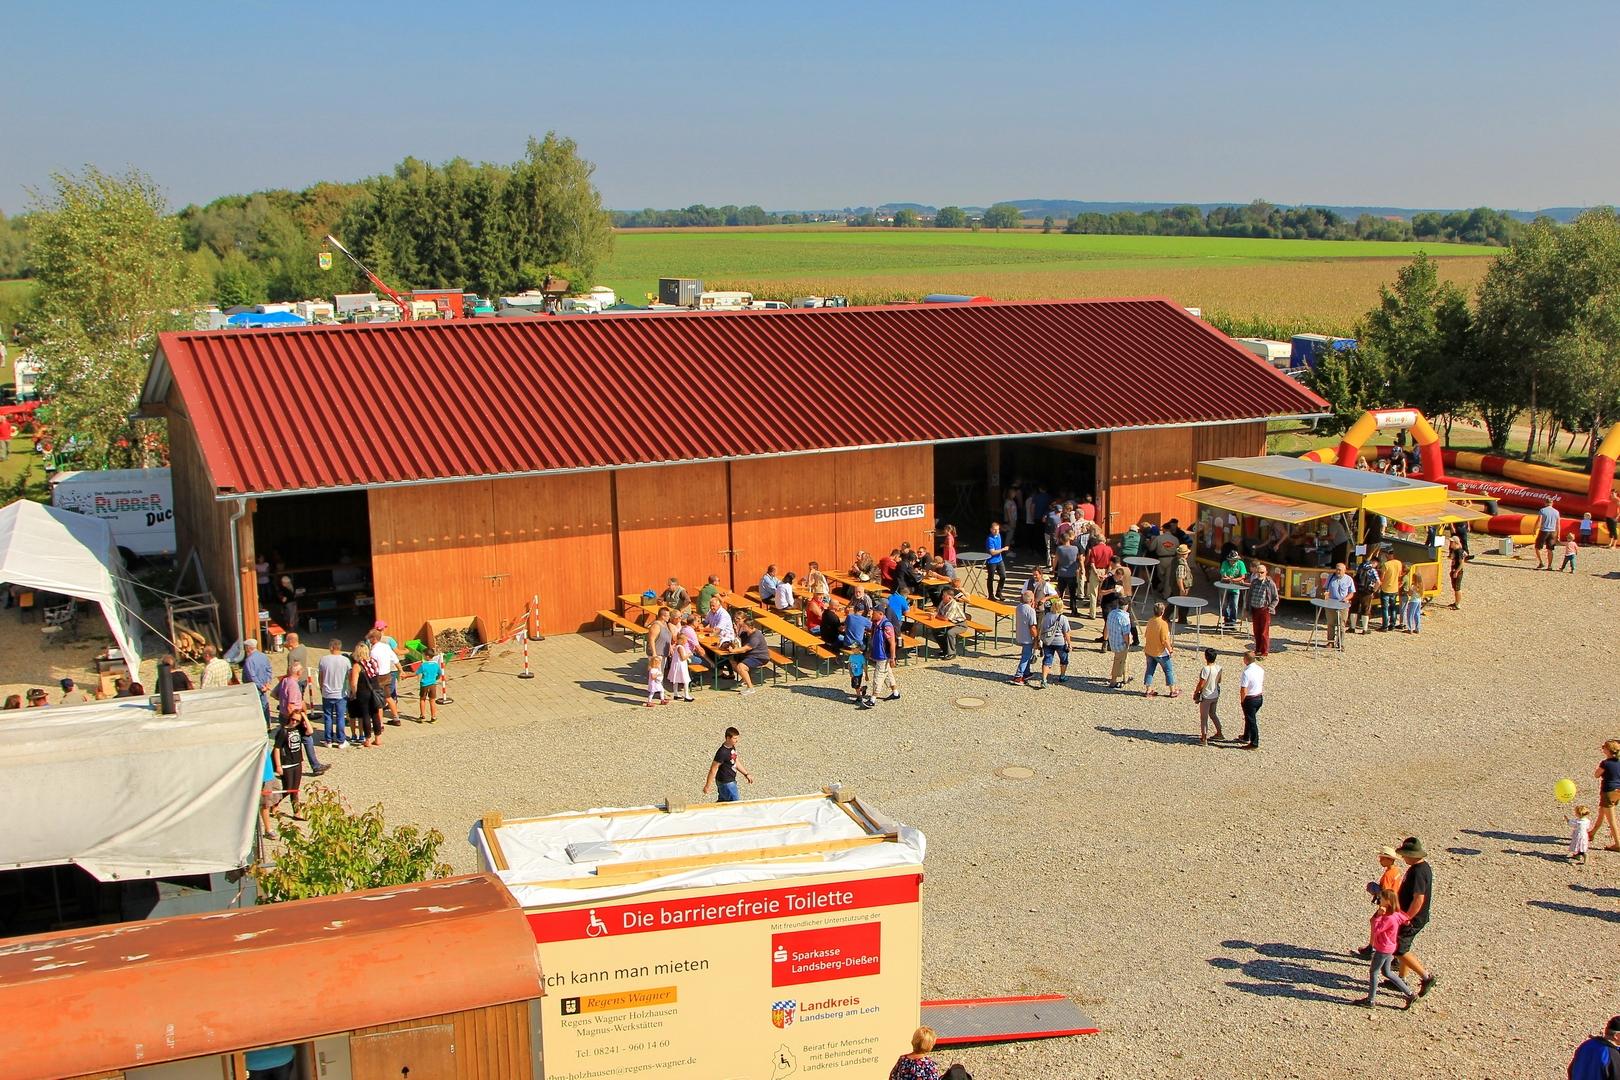 2018_09_14-16 Schleppertreffen Schmiechen  1070